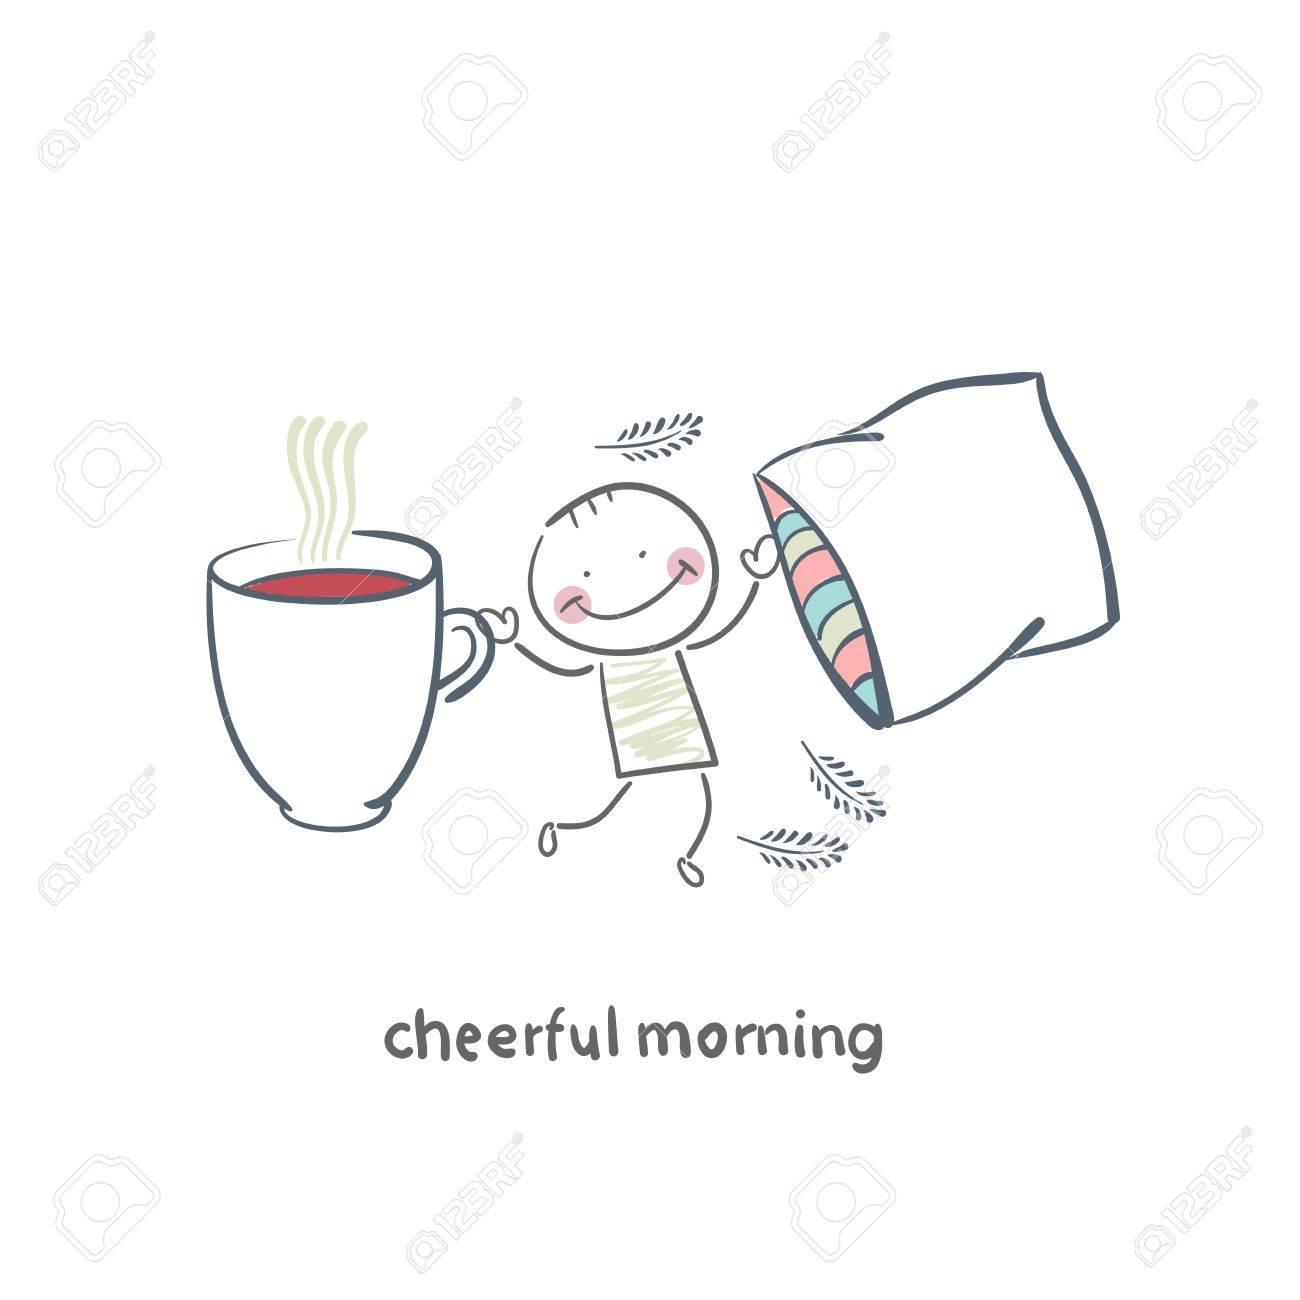 Cheerful morning Stock Vector - 18953197